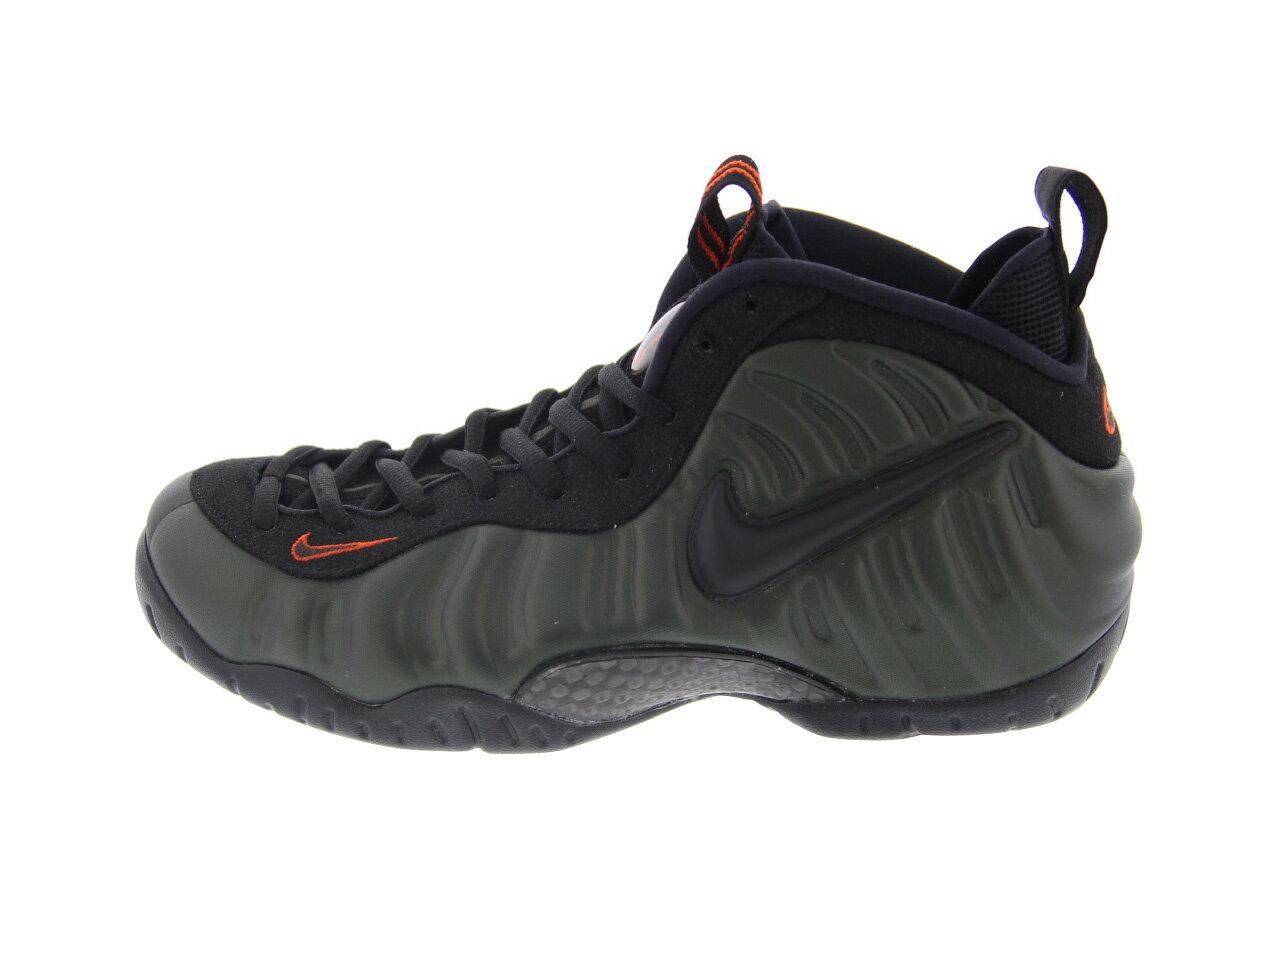 NIKE AIR FOAMPOSITE PRO(624041-304)【ナイキ エアフォームポジット プロ】【メンズファッション】【シューズ】【スニーカー】【靴】【フットウェア】